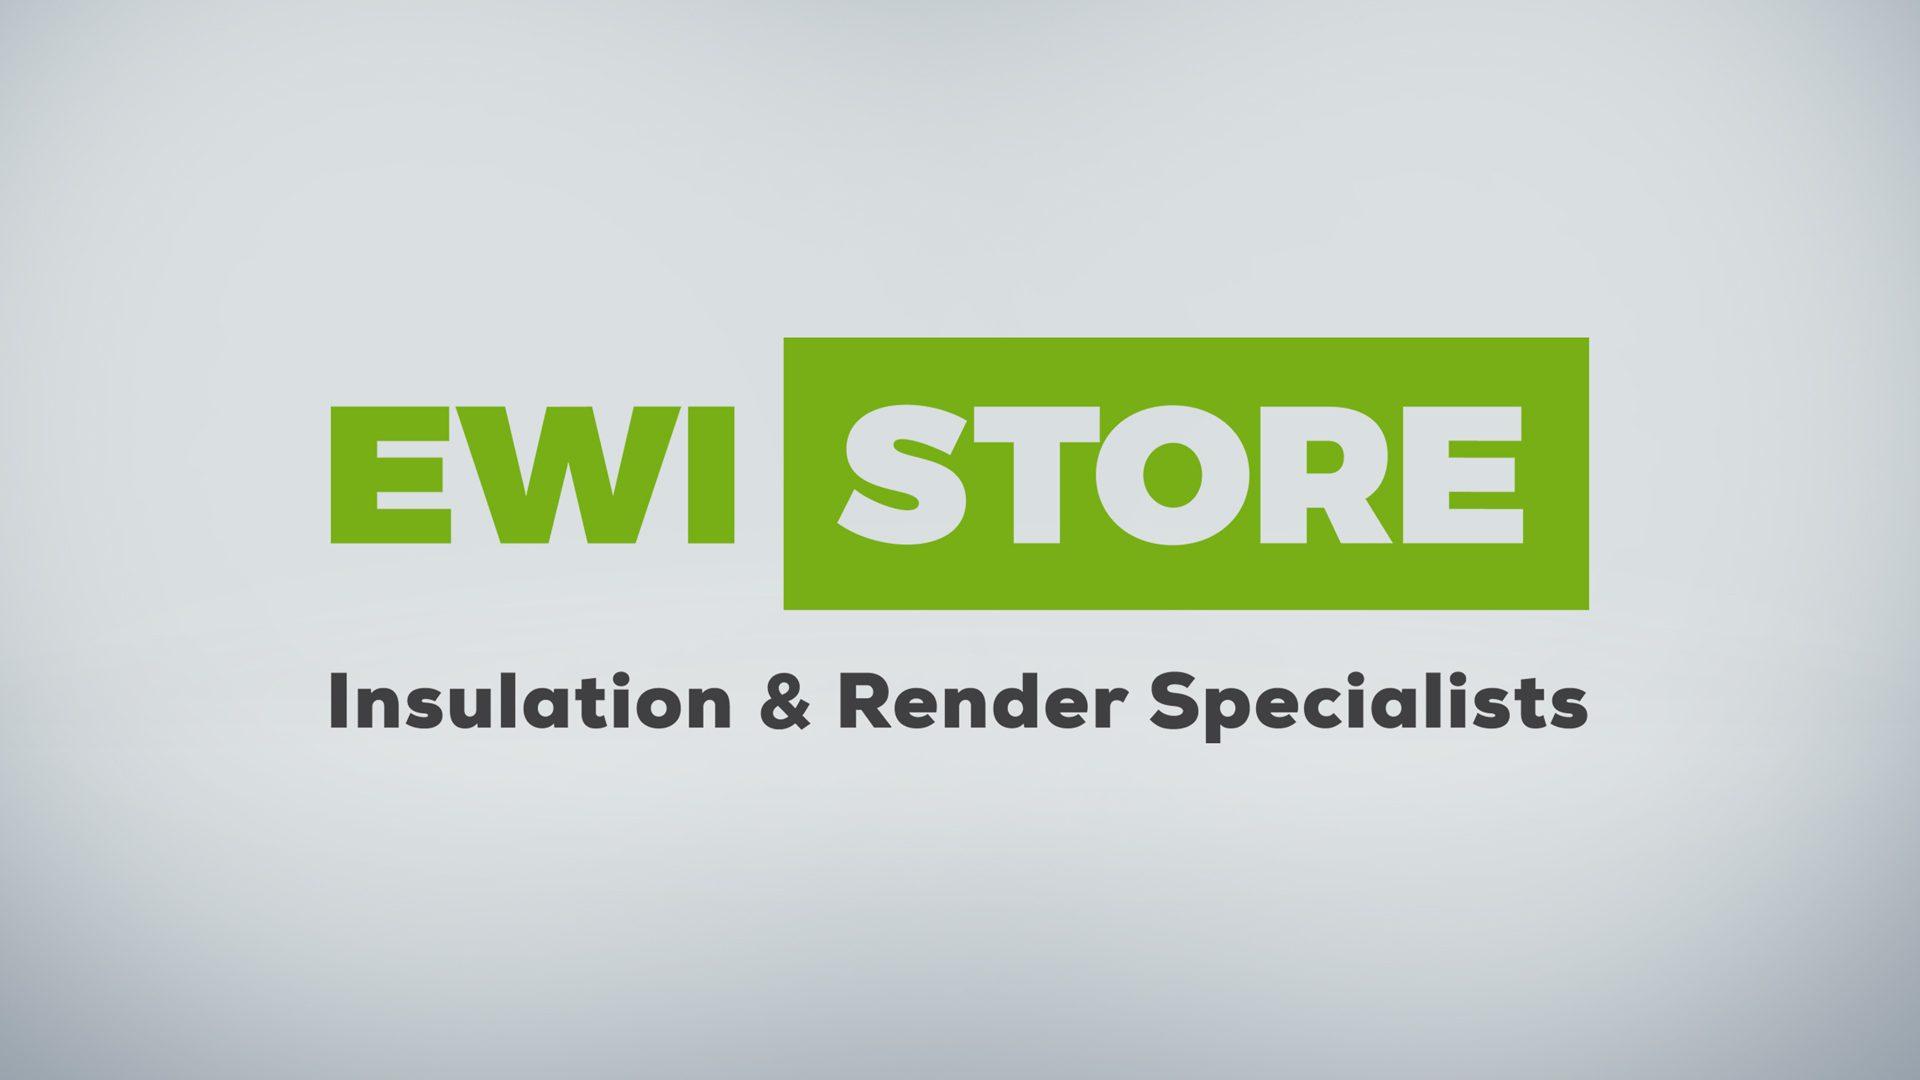 EWI Store logo